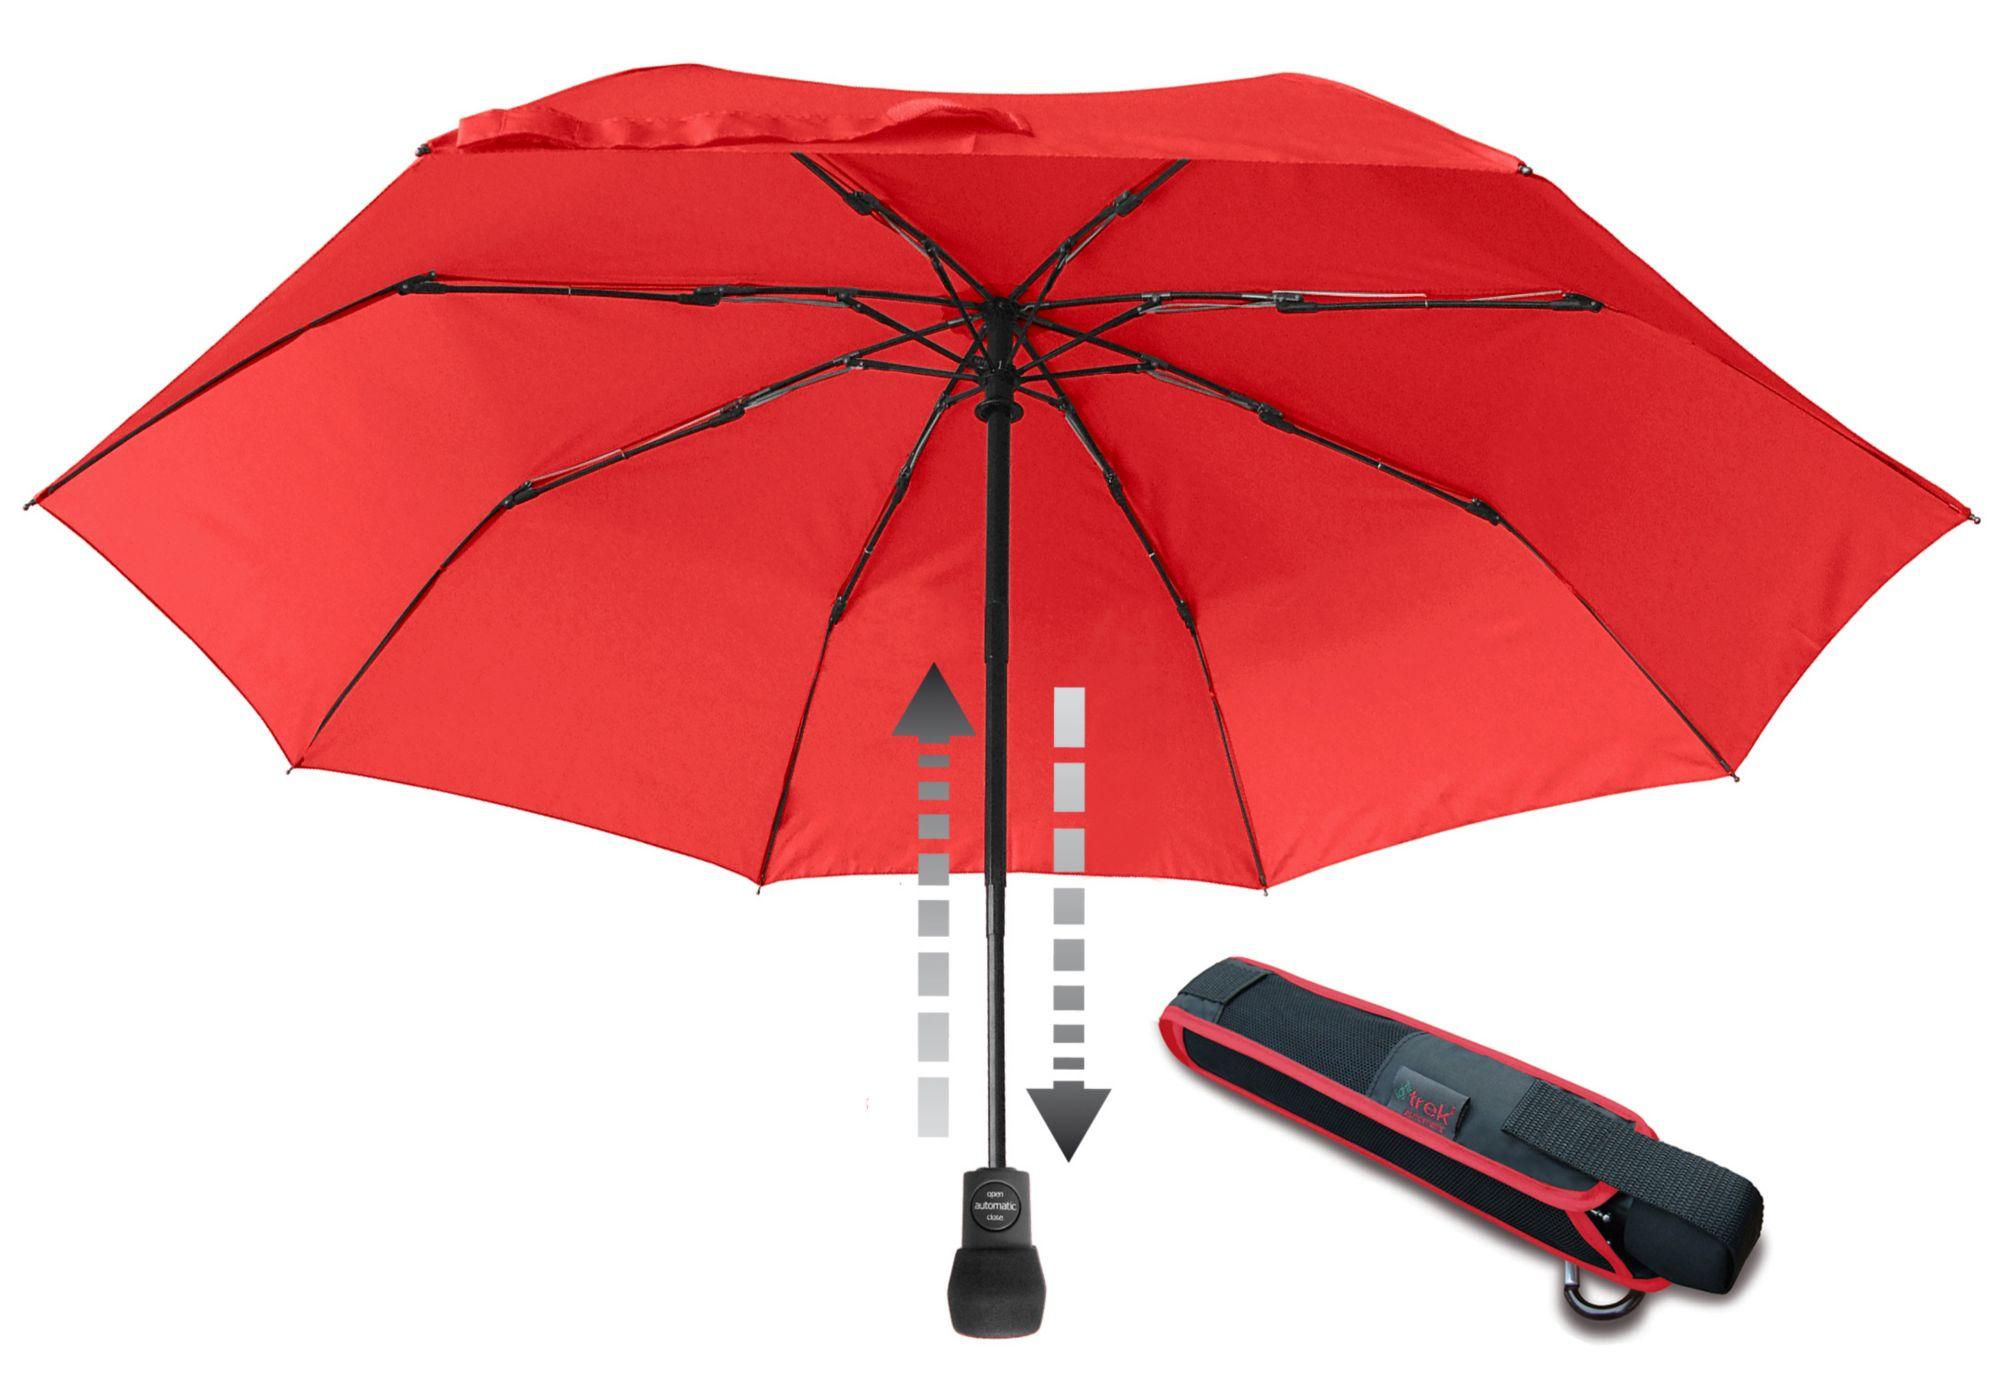 EUROSCHIRM® Euroschirm® Regenschirm - Taschenschirm, »light trek automatic Taschenschirm«